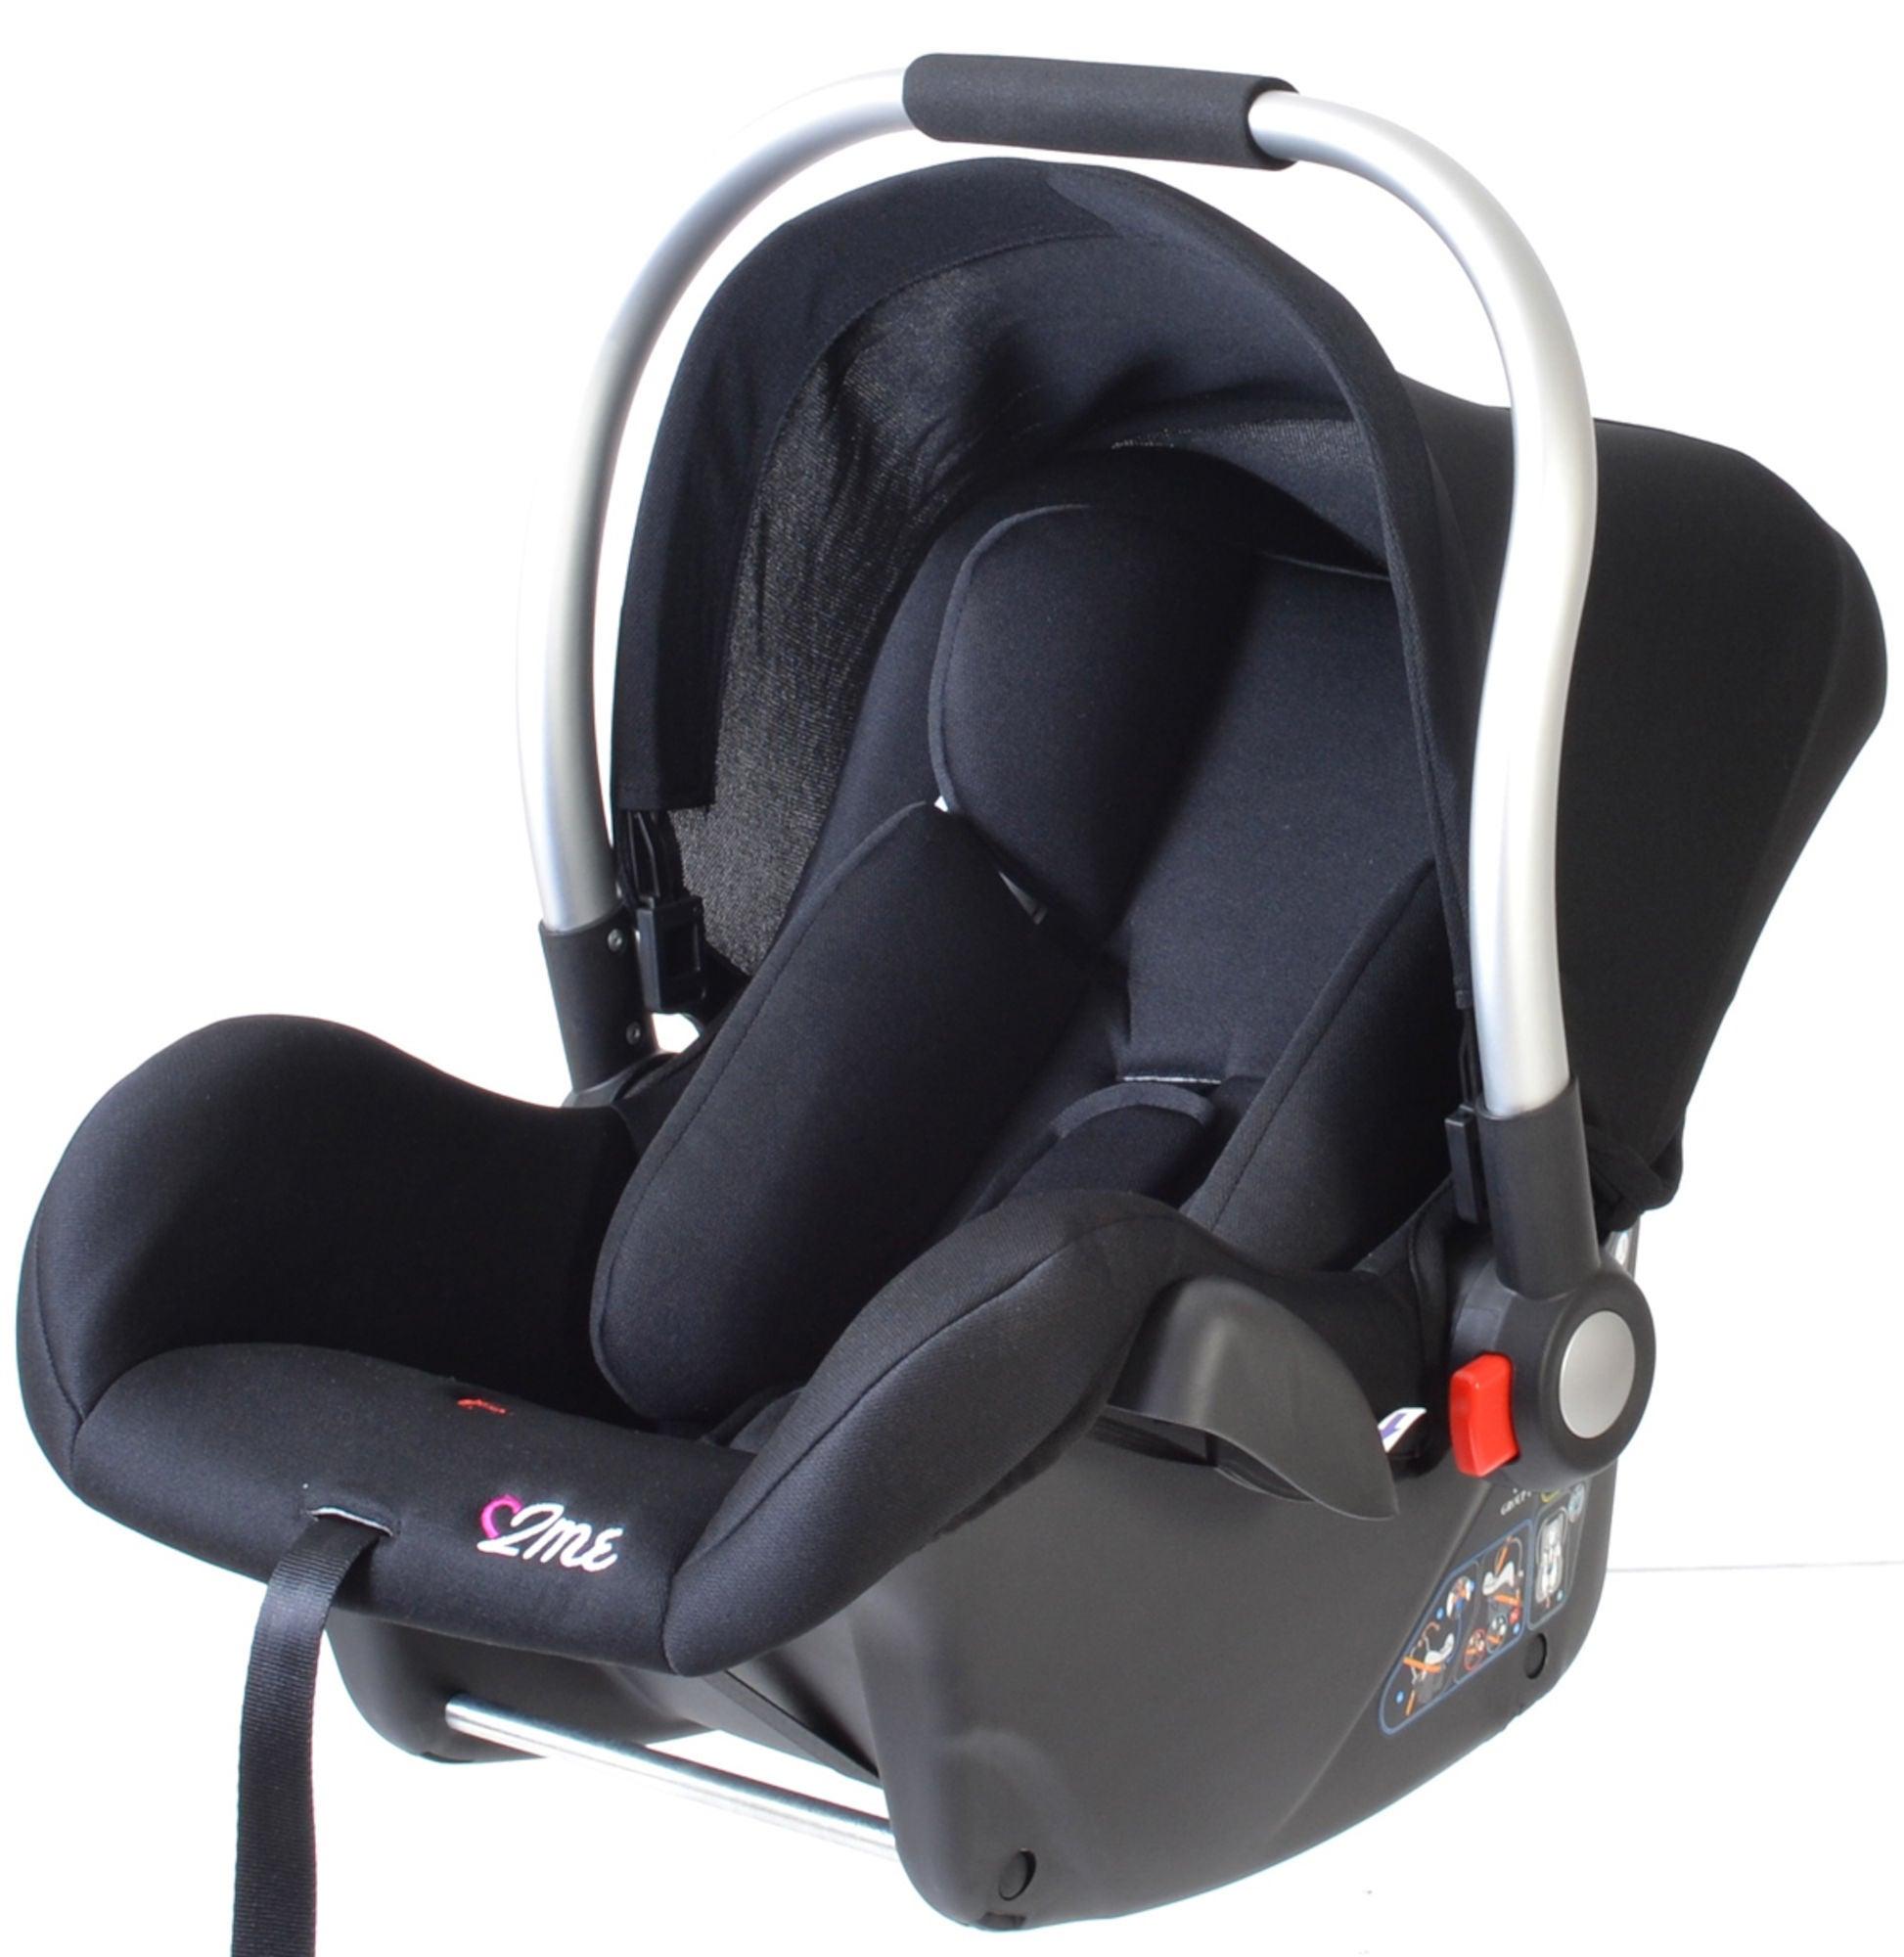 2ME Babyskydd Monza Svart